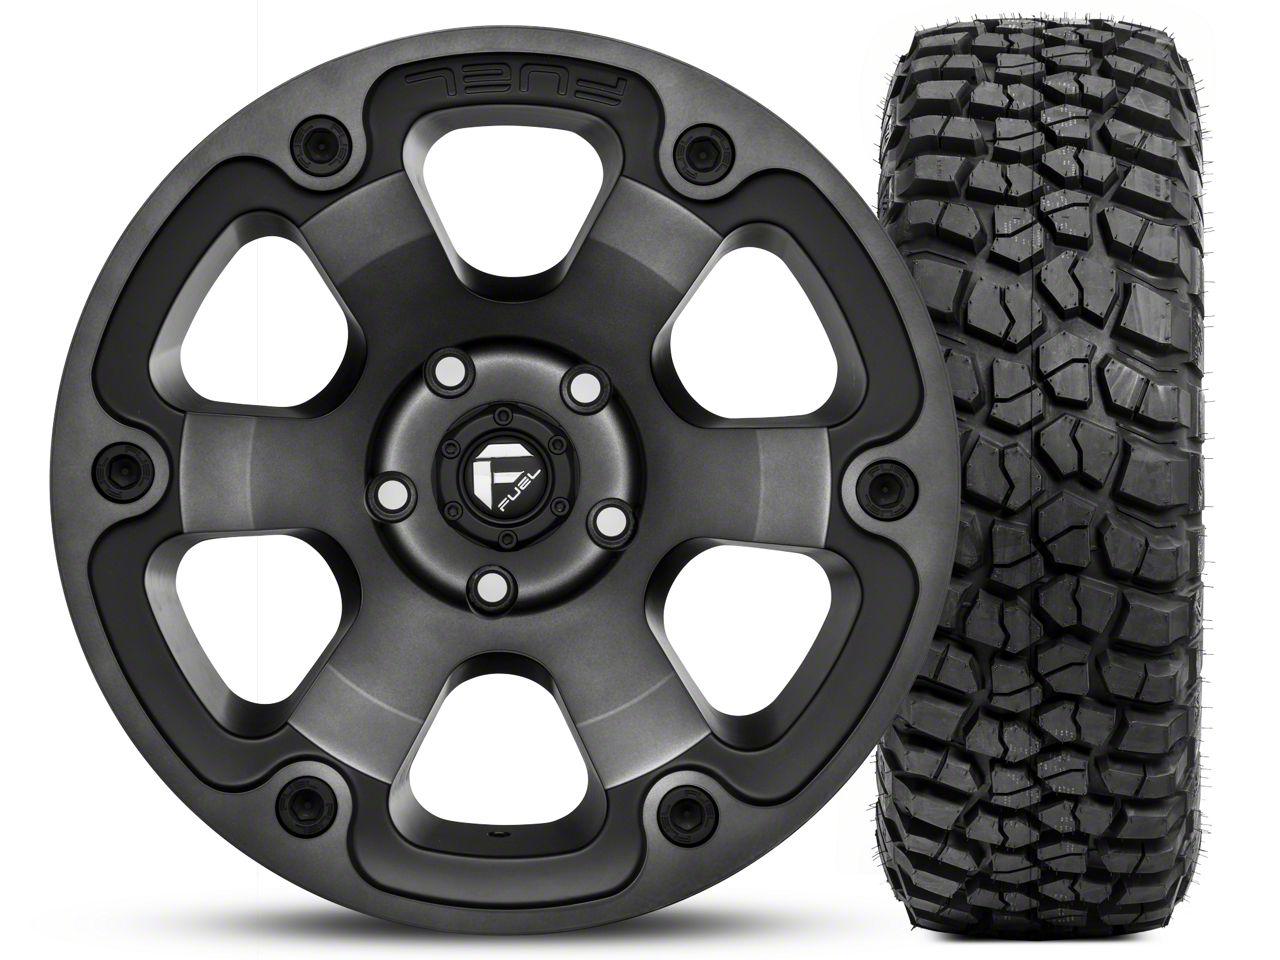 Fuel Wheels Beast Black Machined Wheel 17x9 and BF Goodrich Mud Terrain T/A KM2 265/70R17 Kit (07-18 Jeep Wrangler JK)